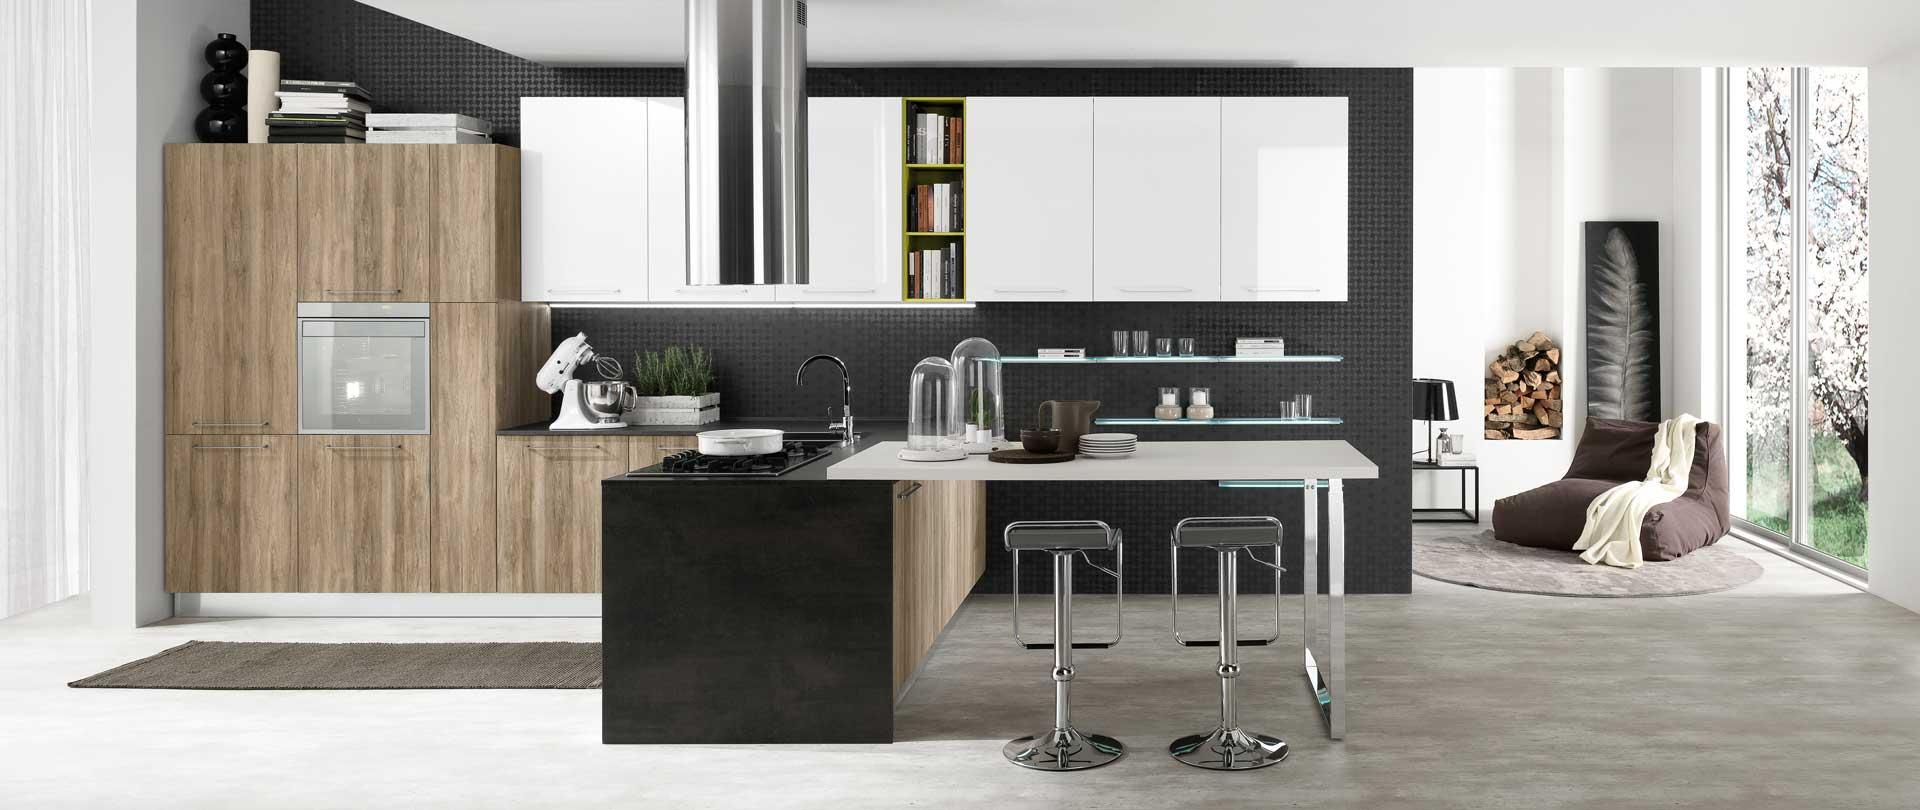 04-evo-cucina-aurora_rovere-moka